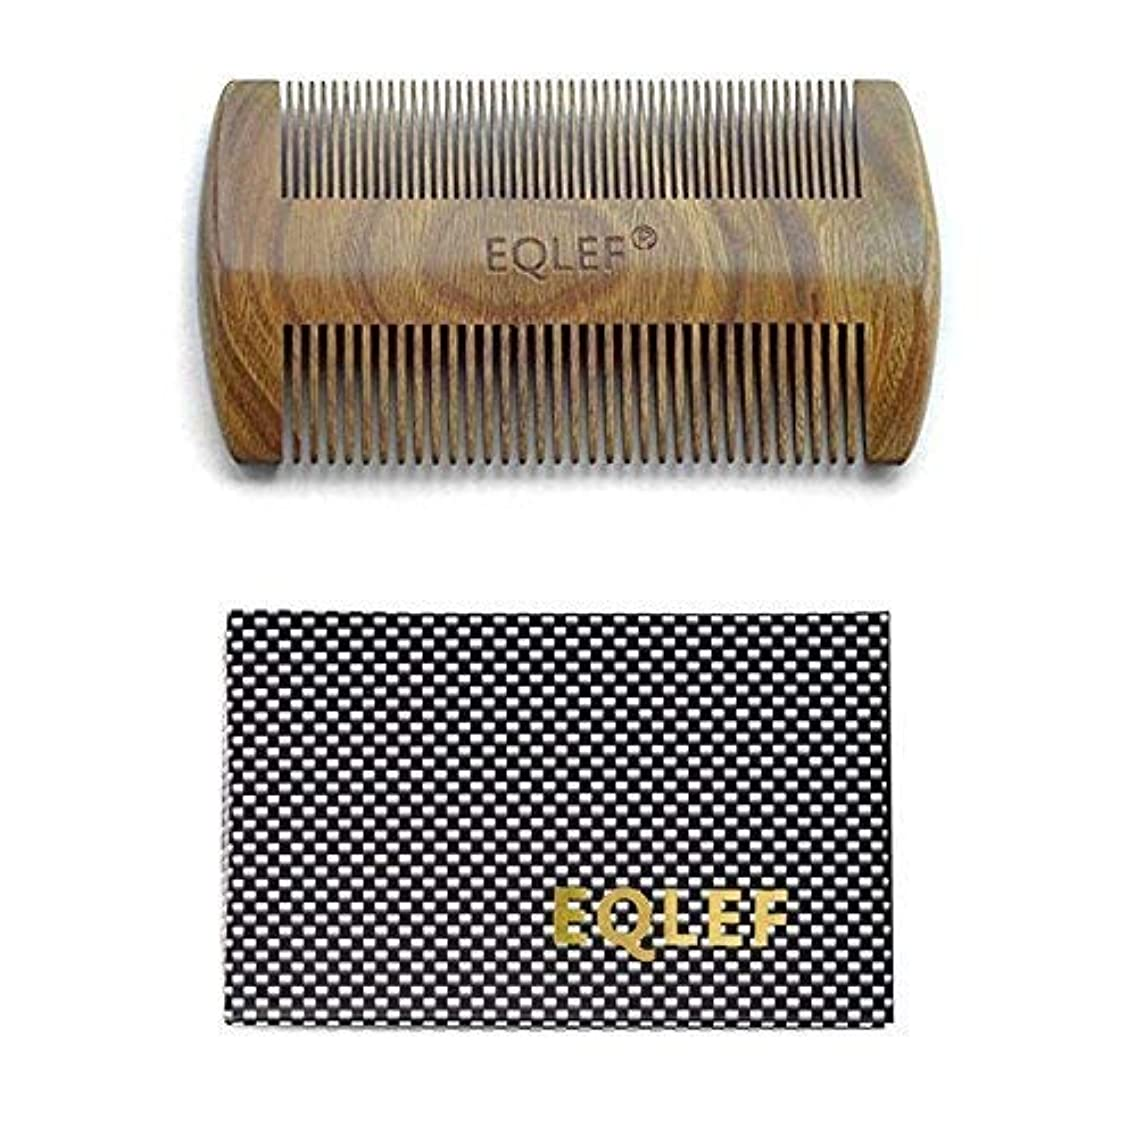 EQLEF? Green sandalwood no static handmade comb,Pocket comb (beard) [並行輸入品]